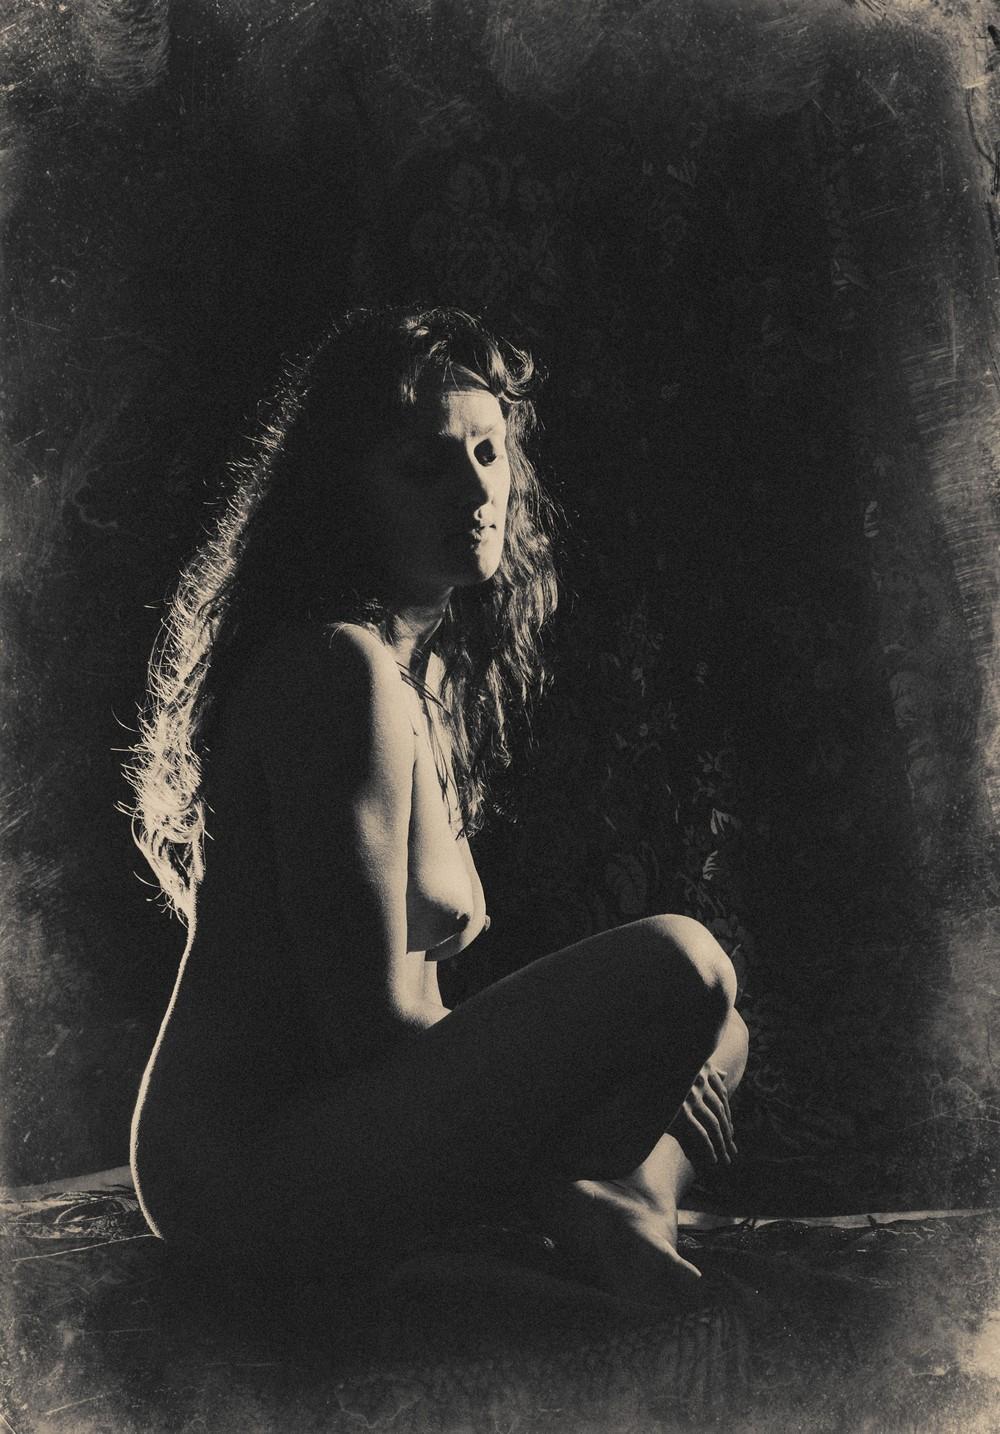 BLACK LADY - PHOTOSHOOTING